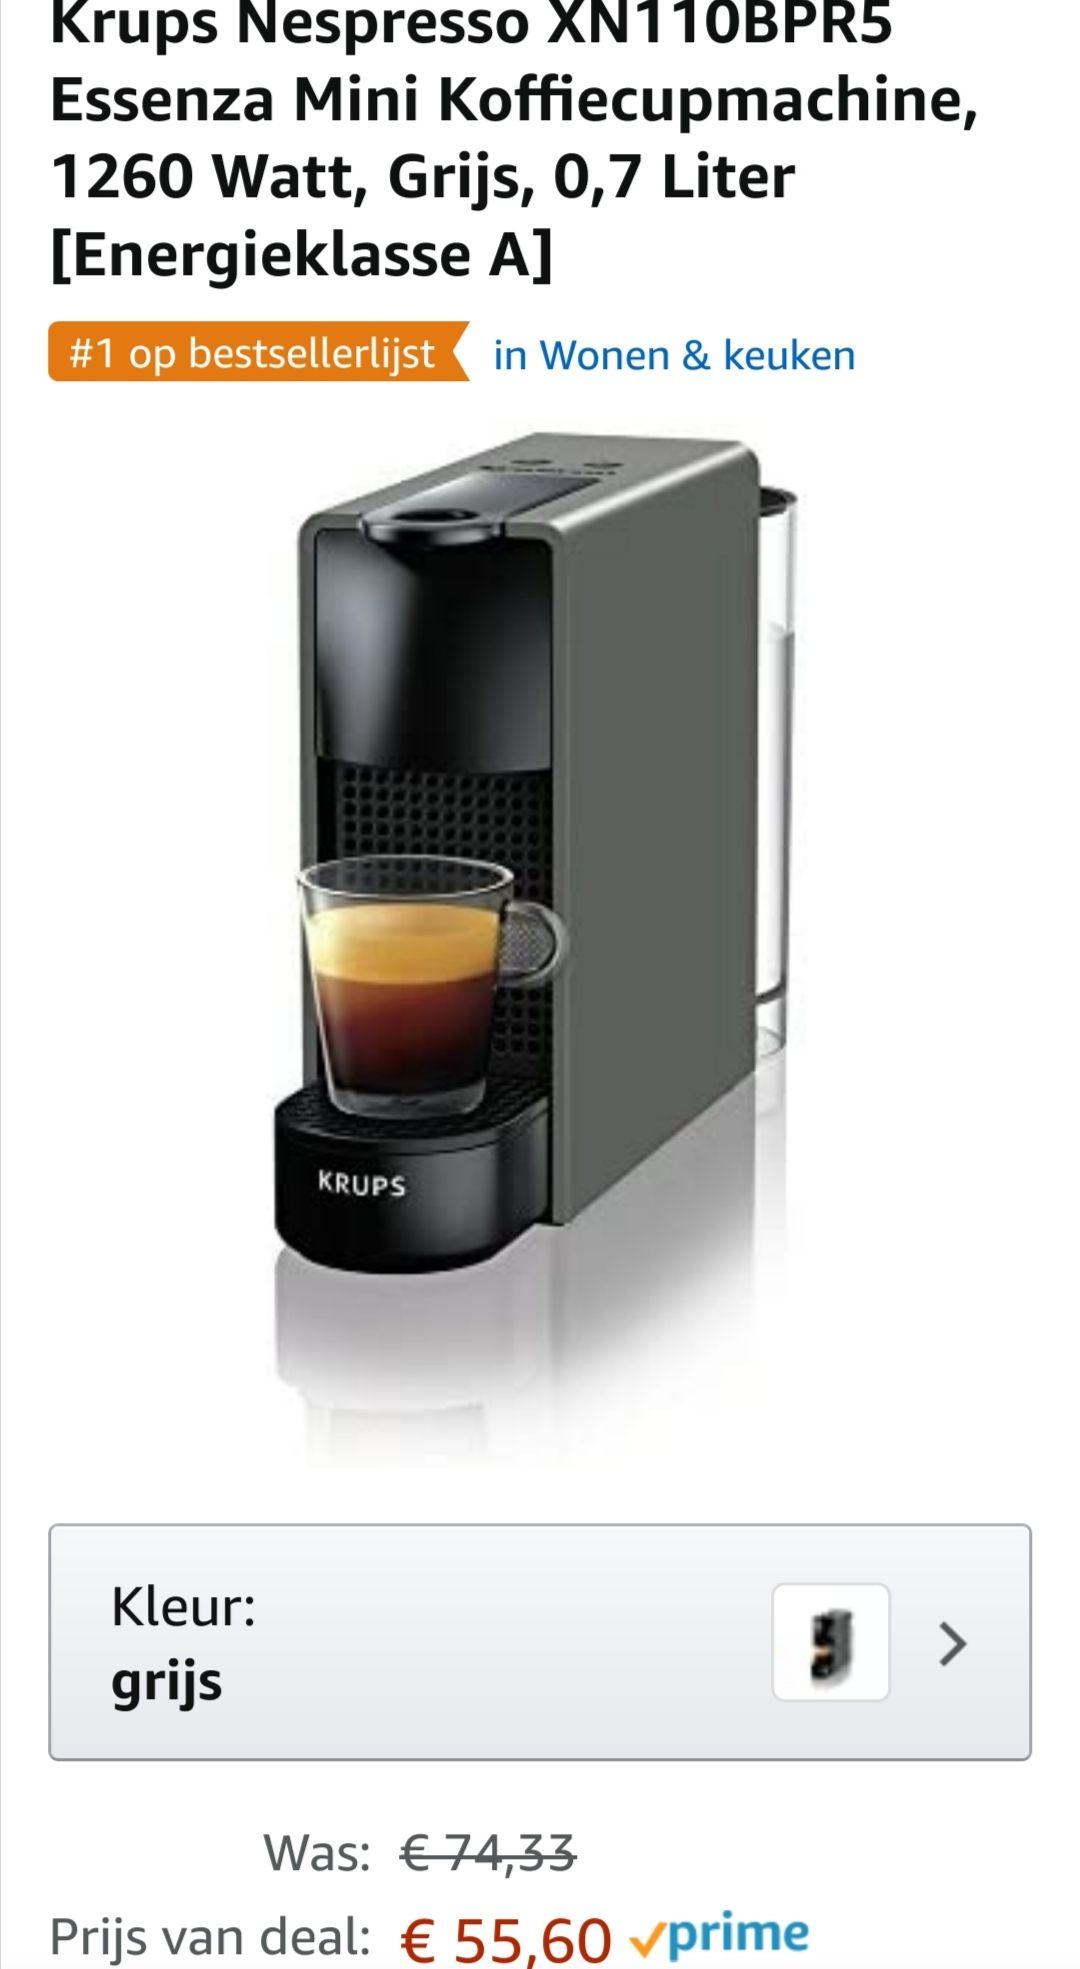 Nespresso XN110BPR5 essenza mini koffiecupmachine en 100 cups met flinke korting.